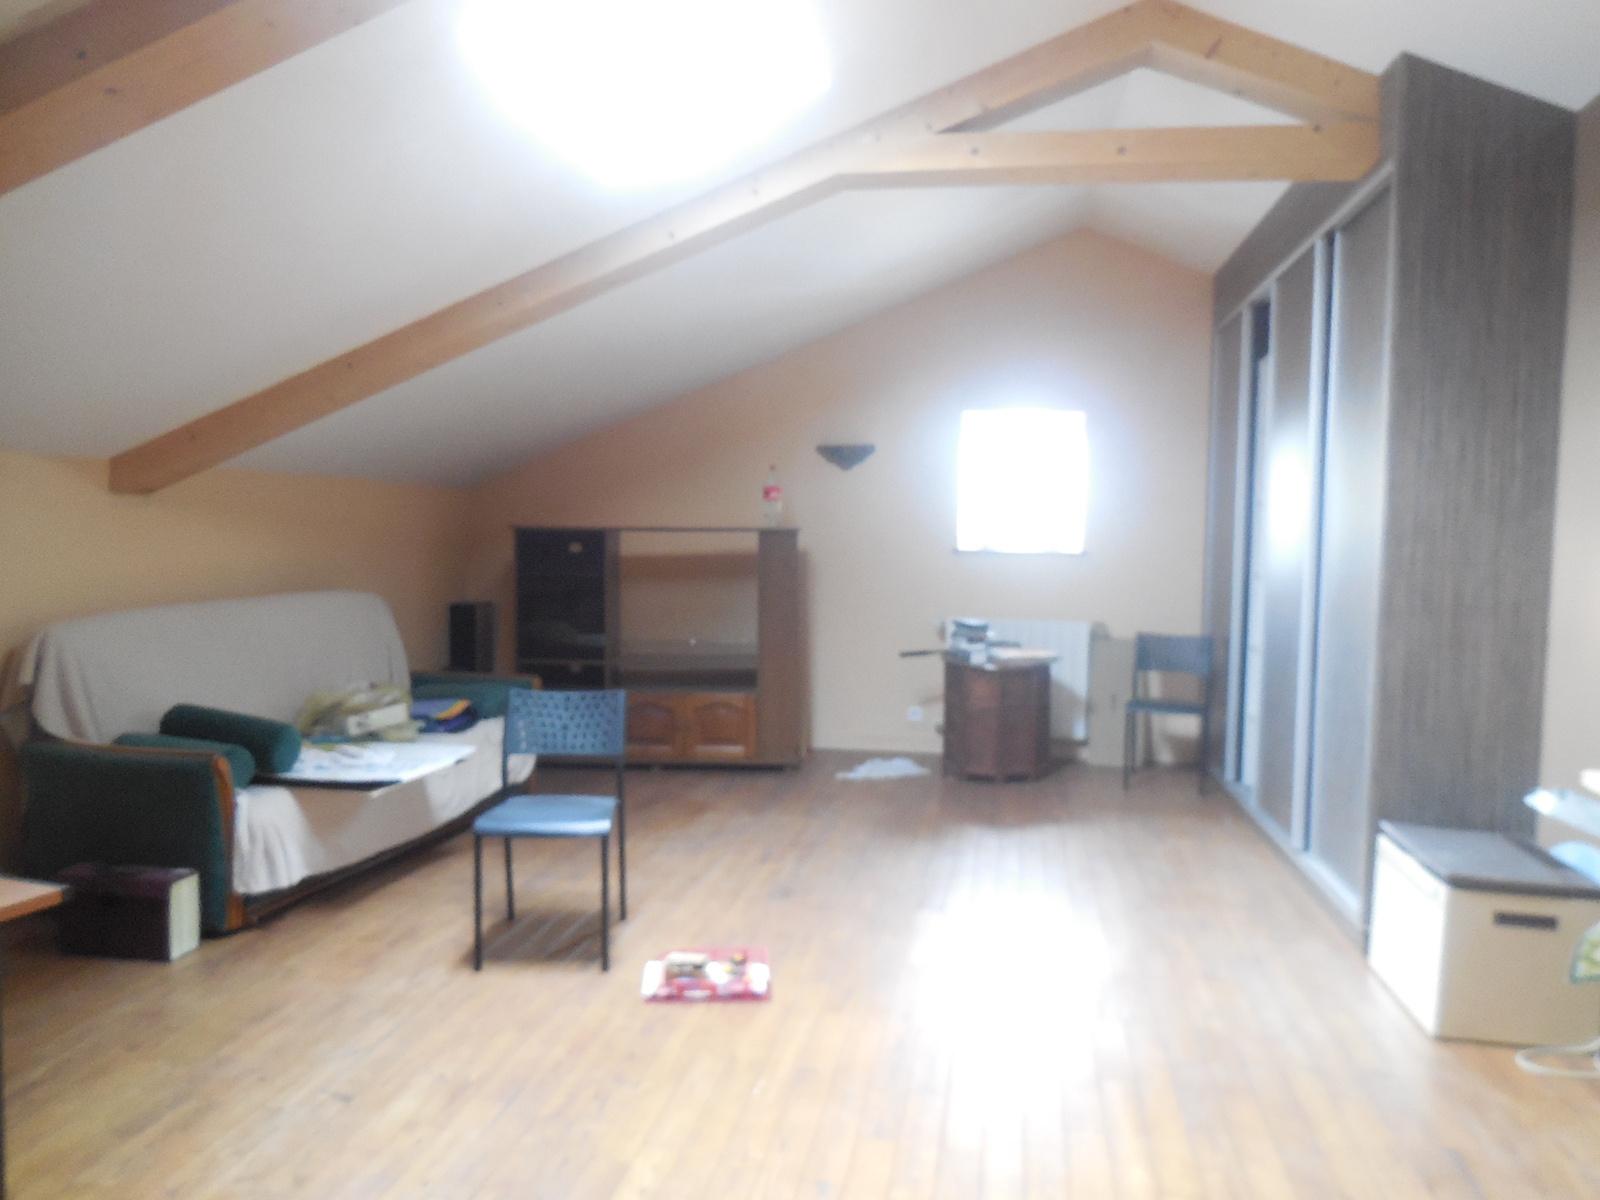 maison/villa la rochelle LA ROCHELLE - QUARTIER LALEU